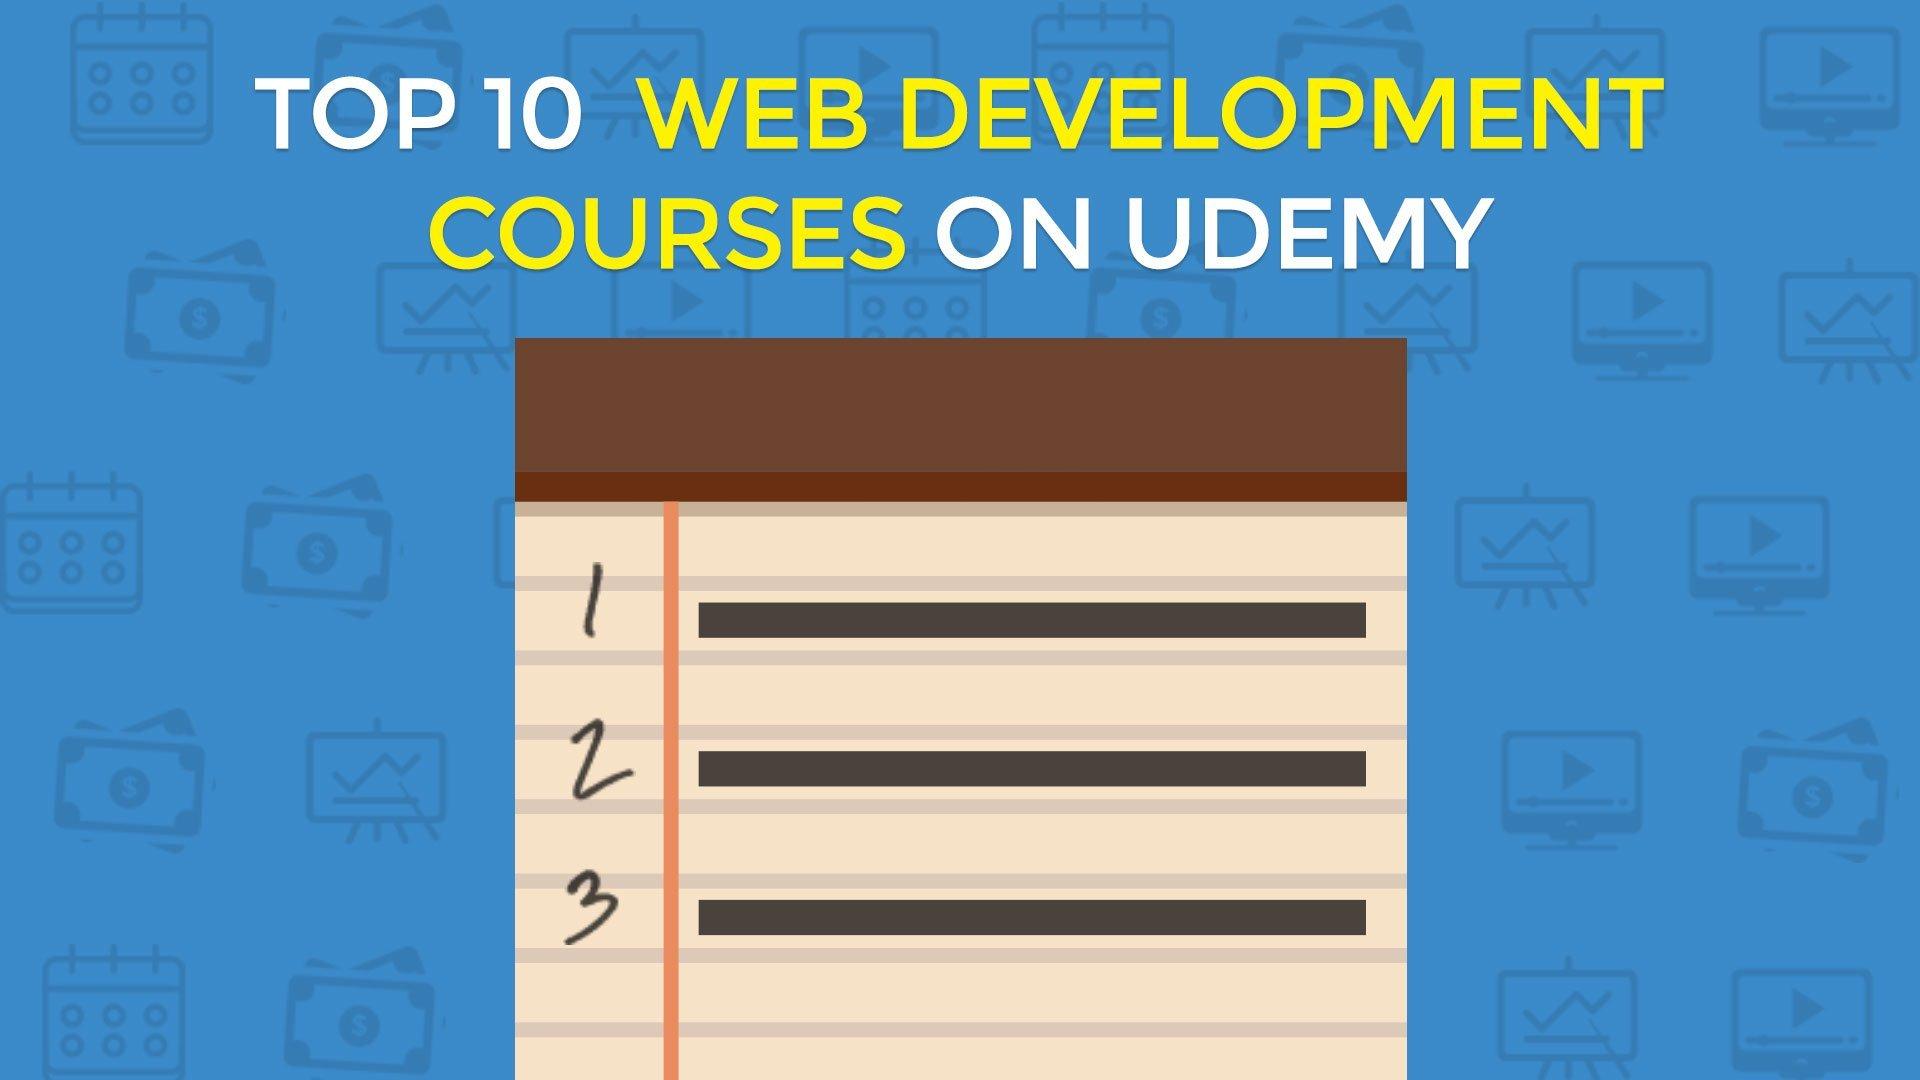 Top 10 Web Development Courses on Udemy - John Morris